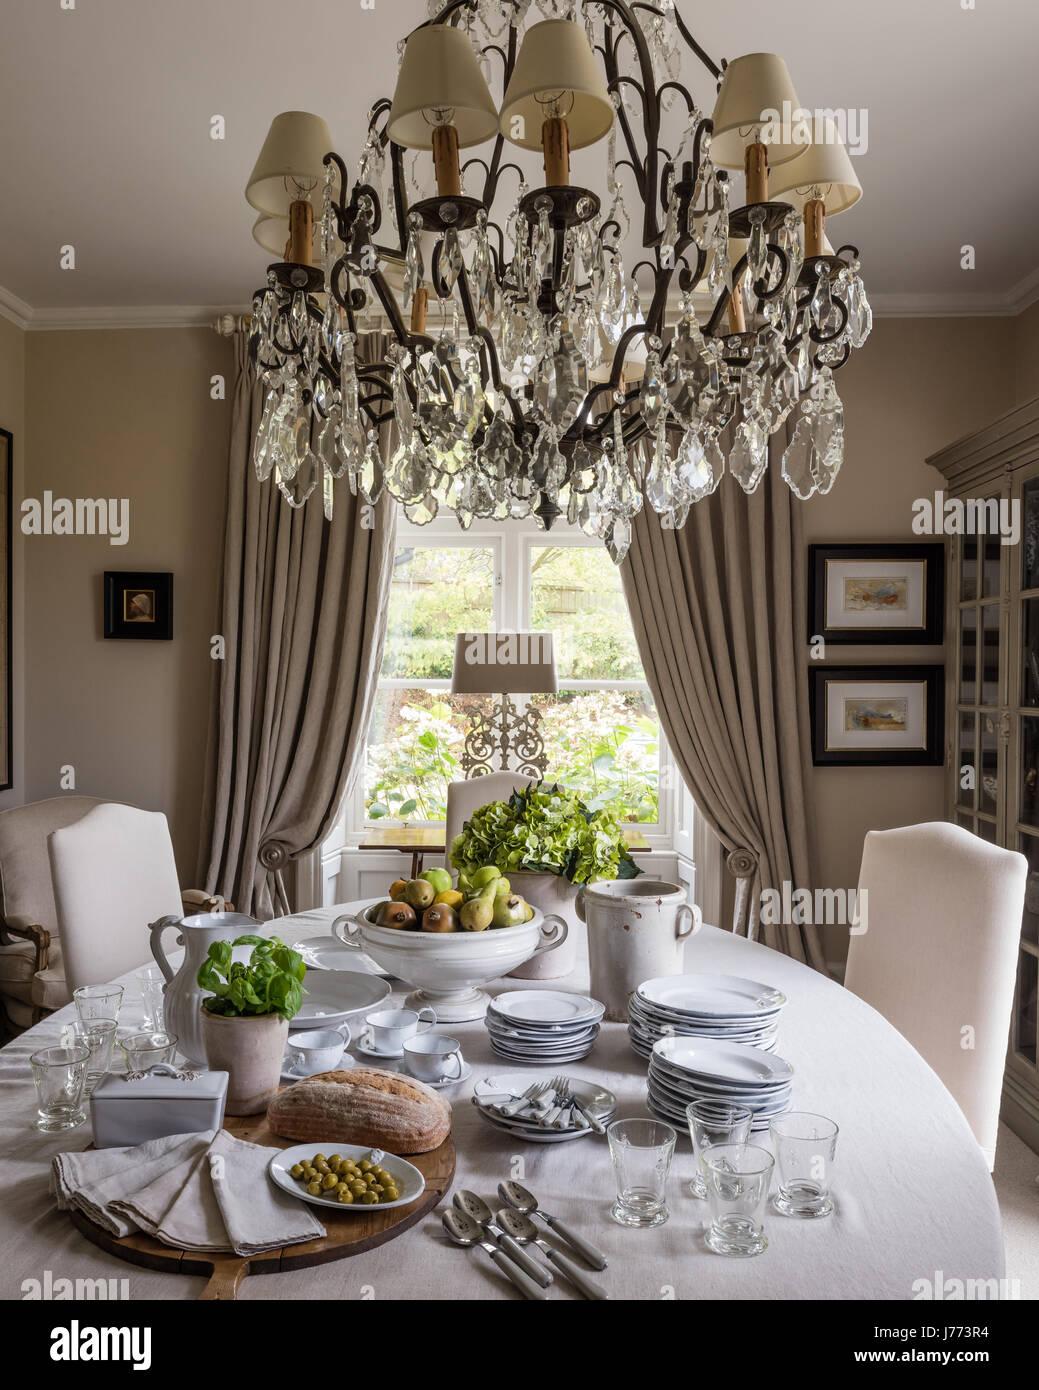 Araña elaboradas y ornamentadas lámparas de mesa tanto por Bardoe   Appel  en comedor pintado en f999e61683d4